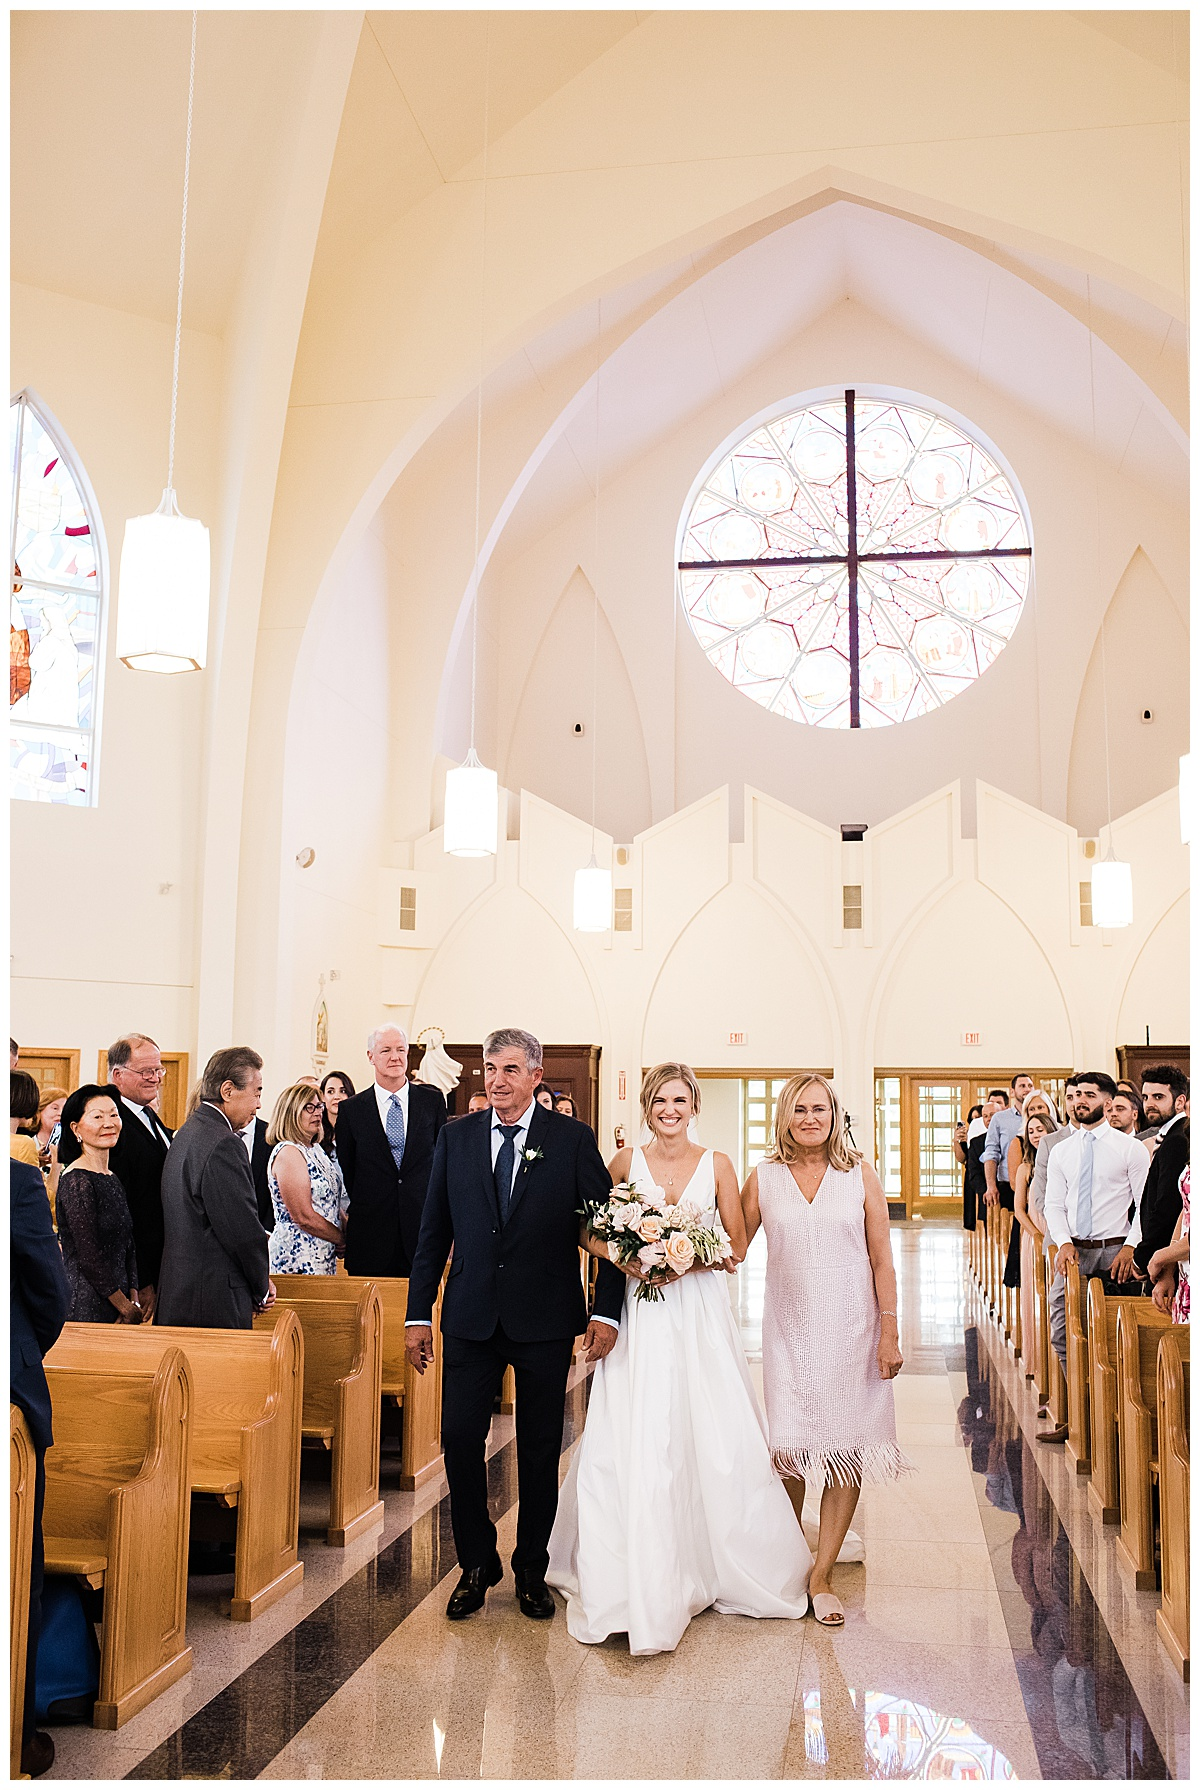 Bride walking down aisle with parents  Ontario wedding  Toronto wedding photography  3photography